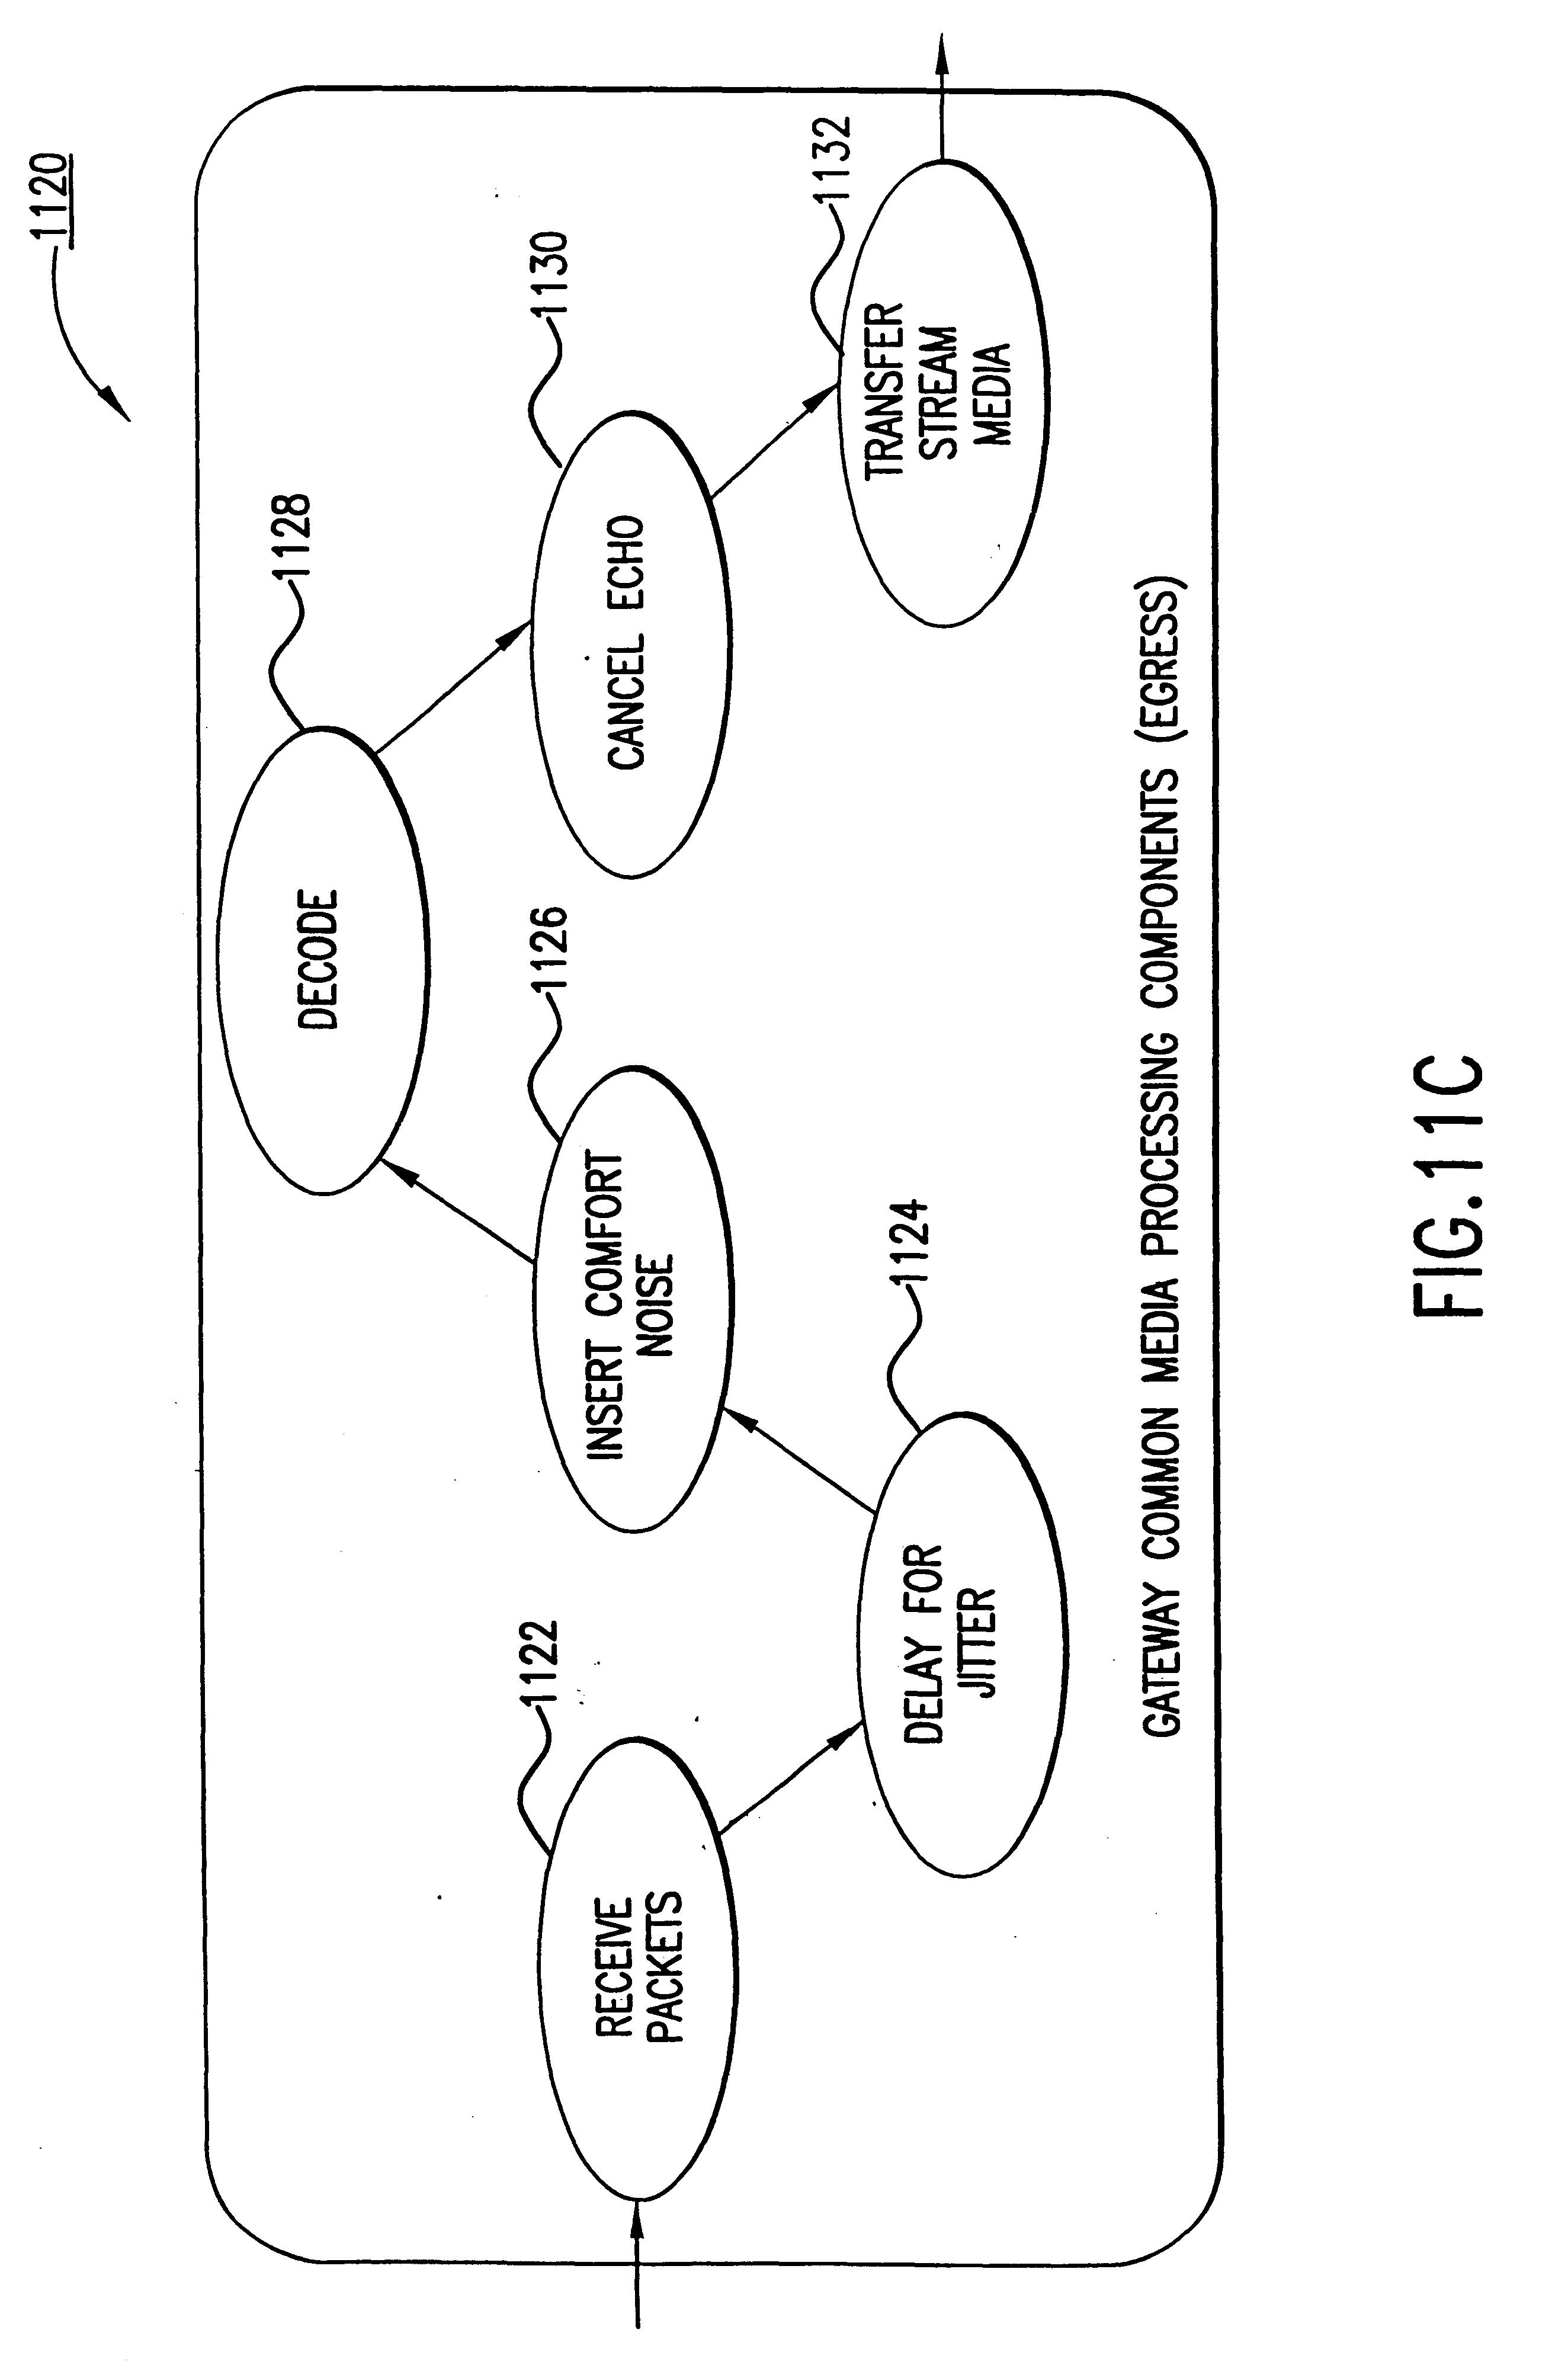 Patent Us 6614781 B1 Mf 1130 Wiring Diagram Images